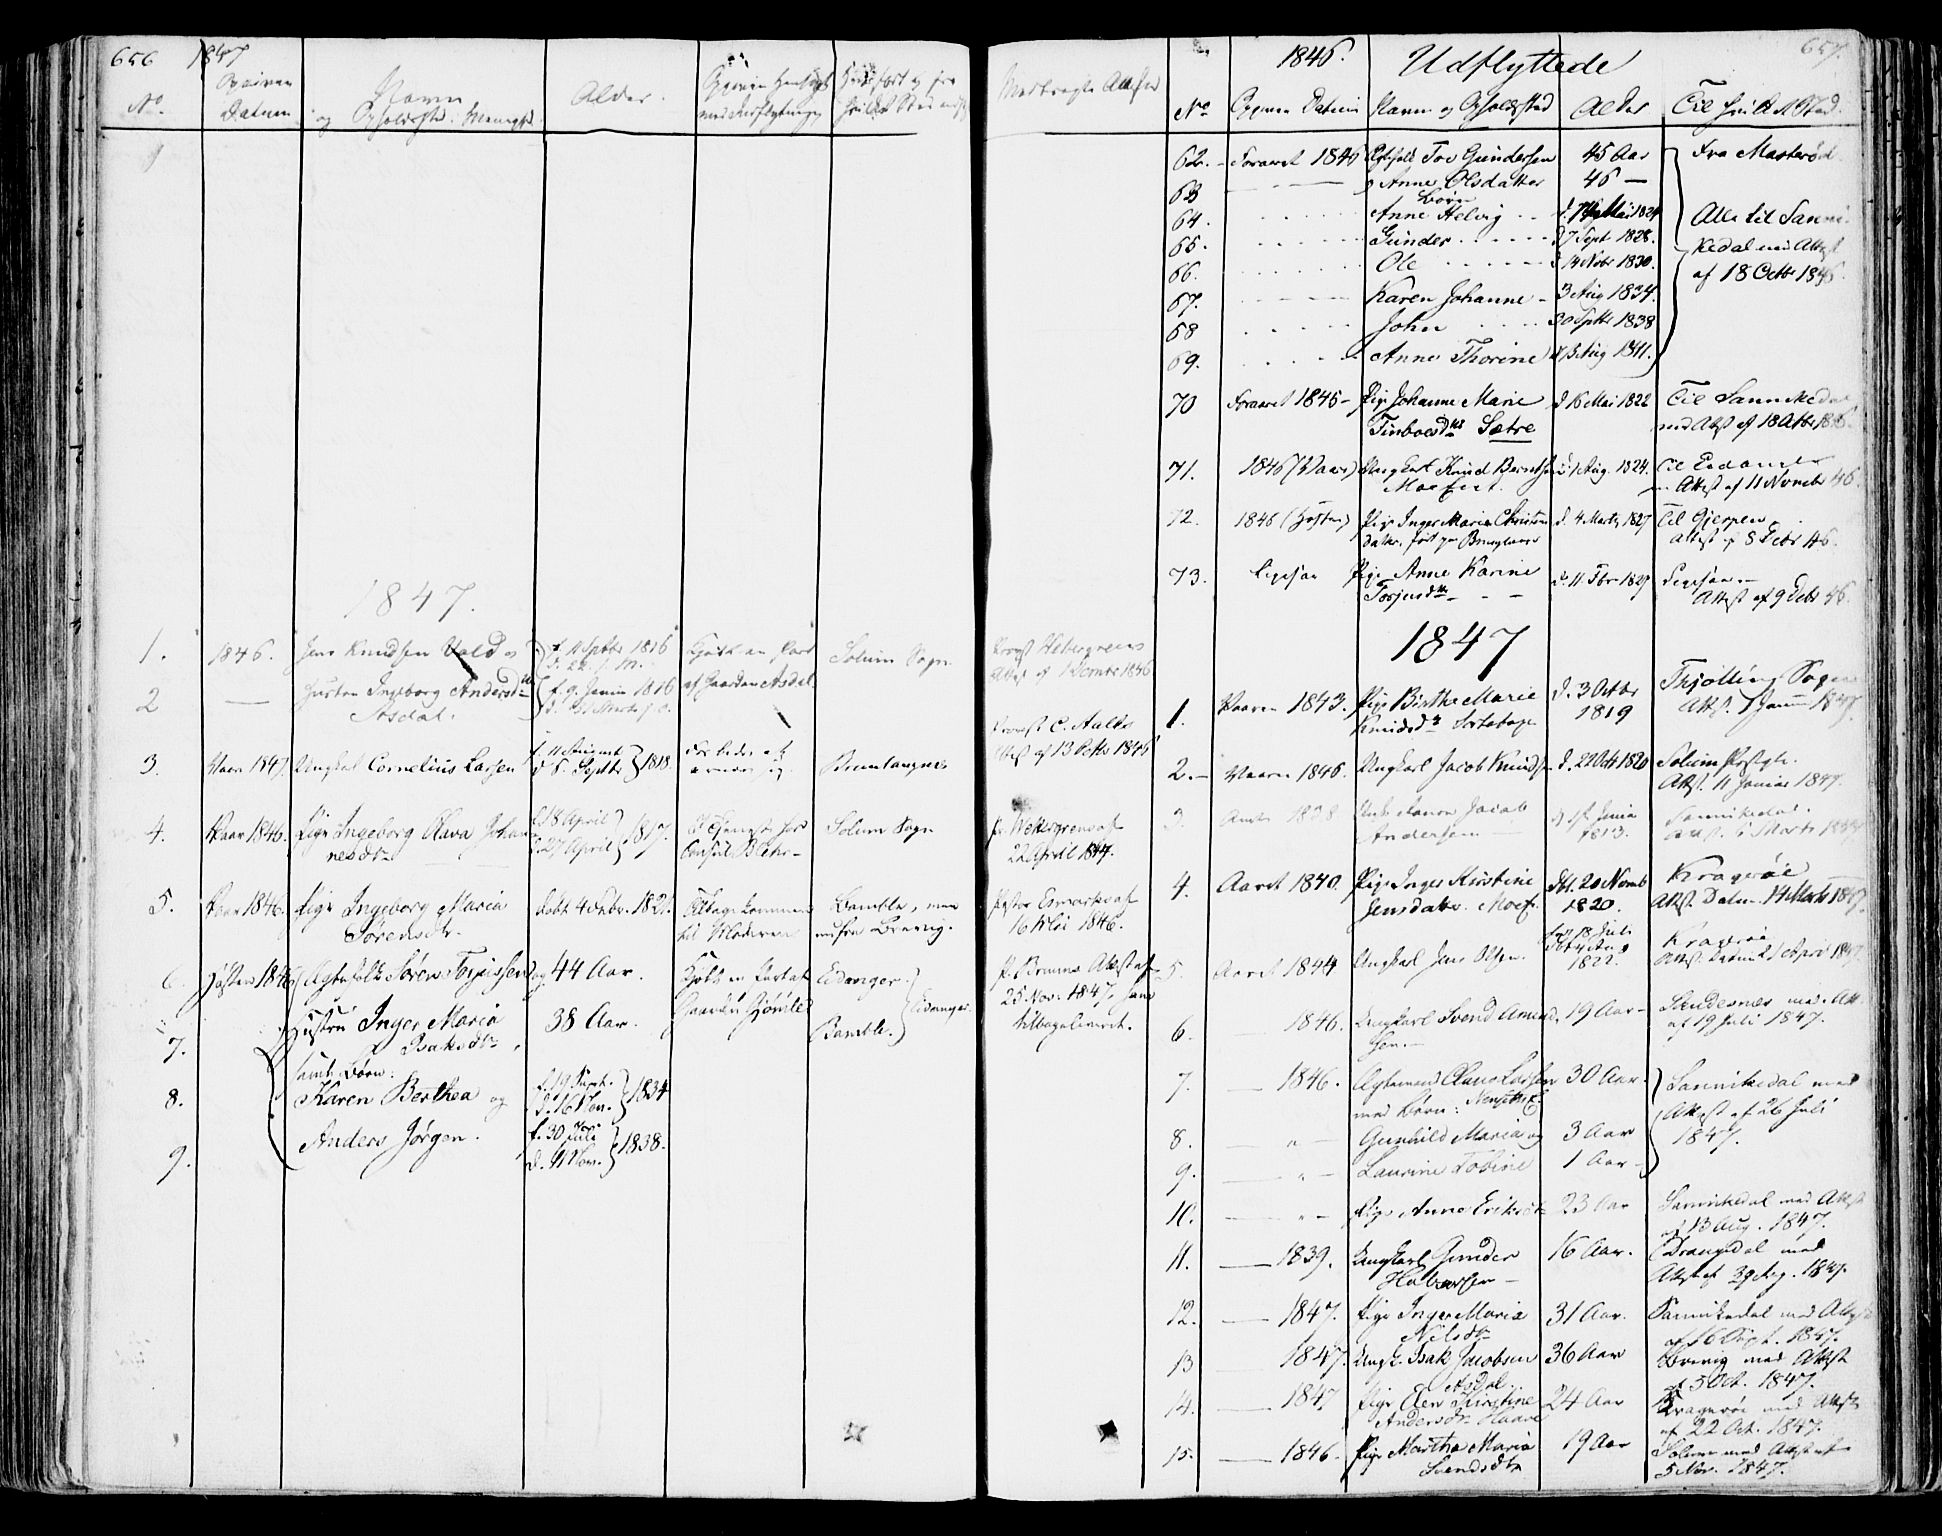 SAKO, Bamble kirkebøker, F/Fa/L0004: Ministerialbok nr. I 4, 1834-1853, s. 656-657